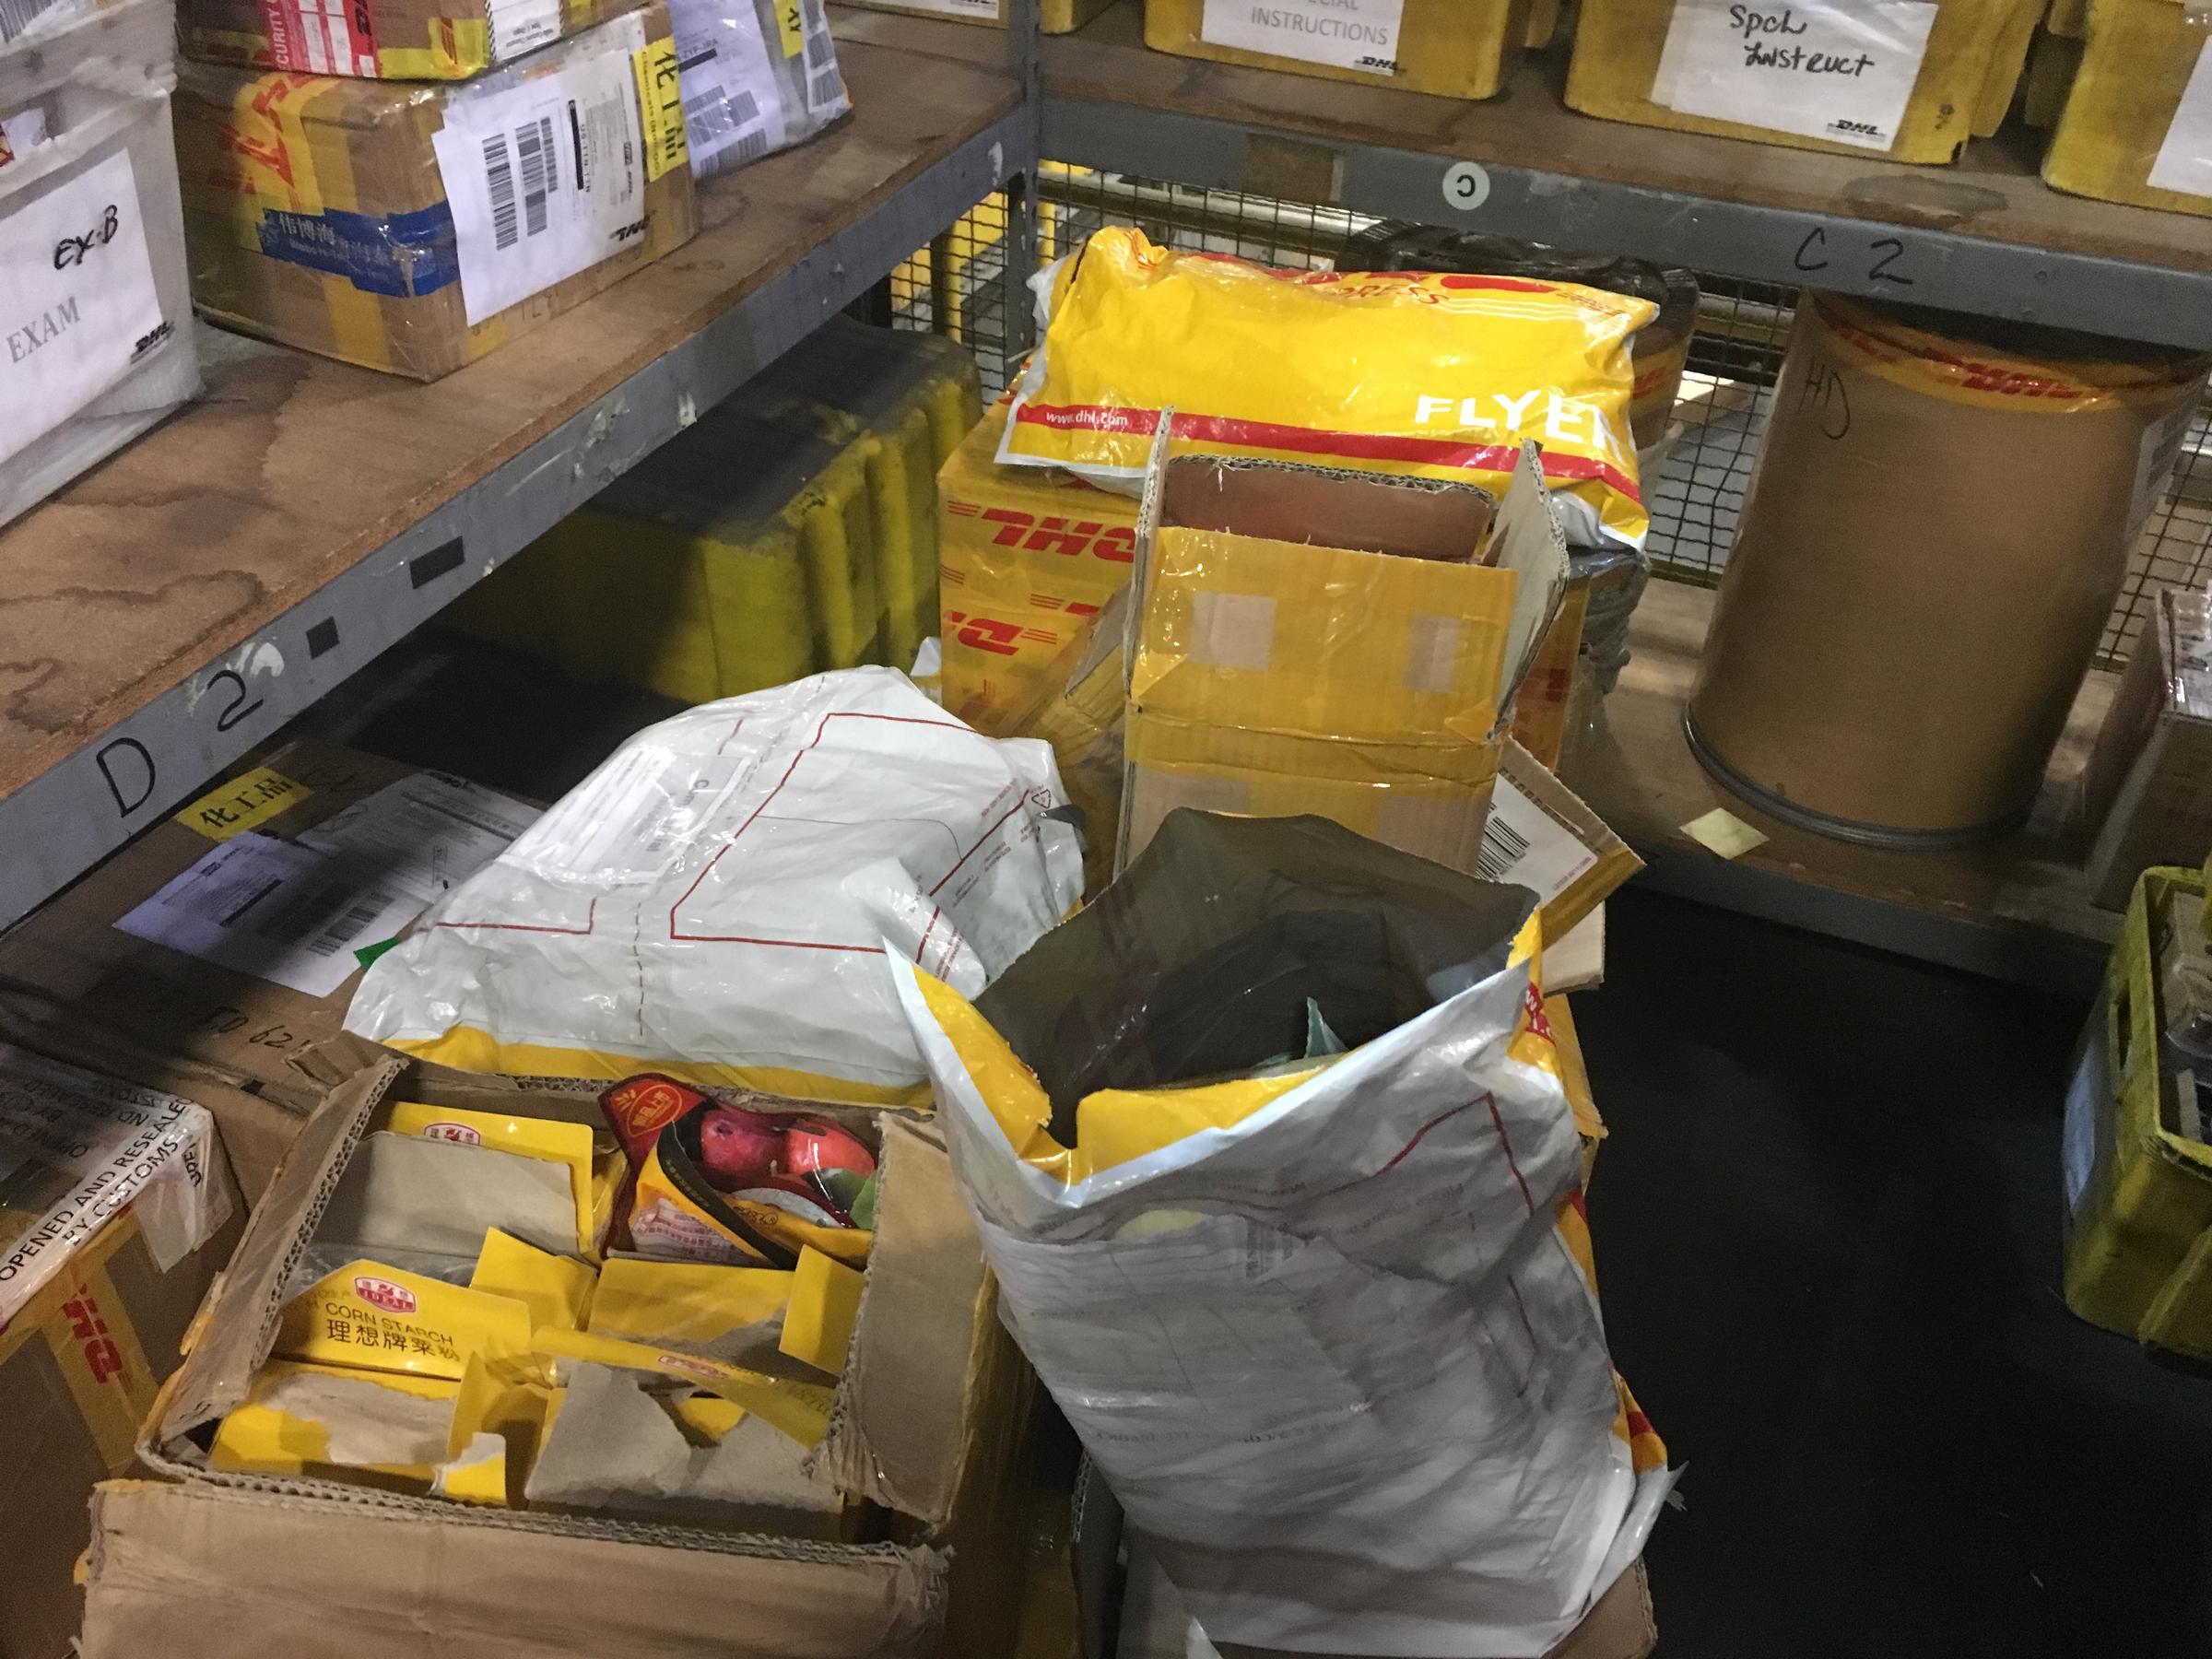 No Let Up In Synthetic Drug Shipments To CVG | WVXU